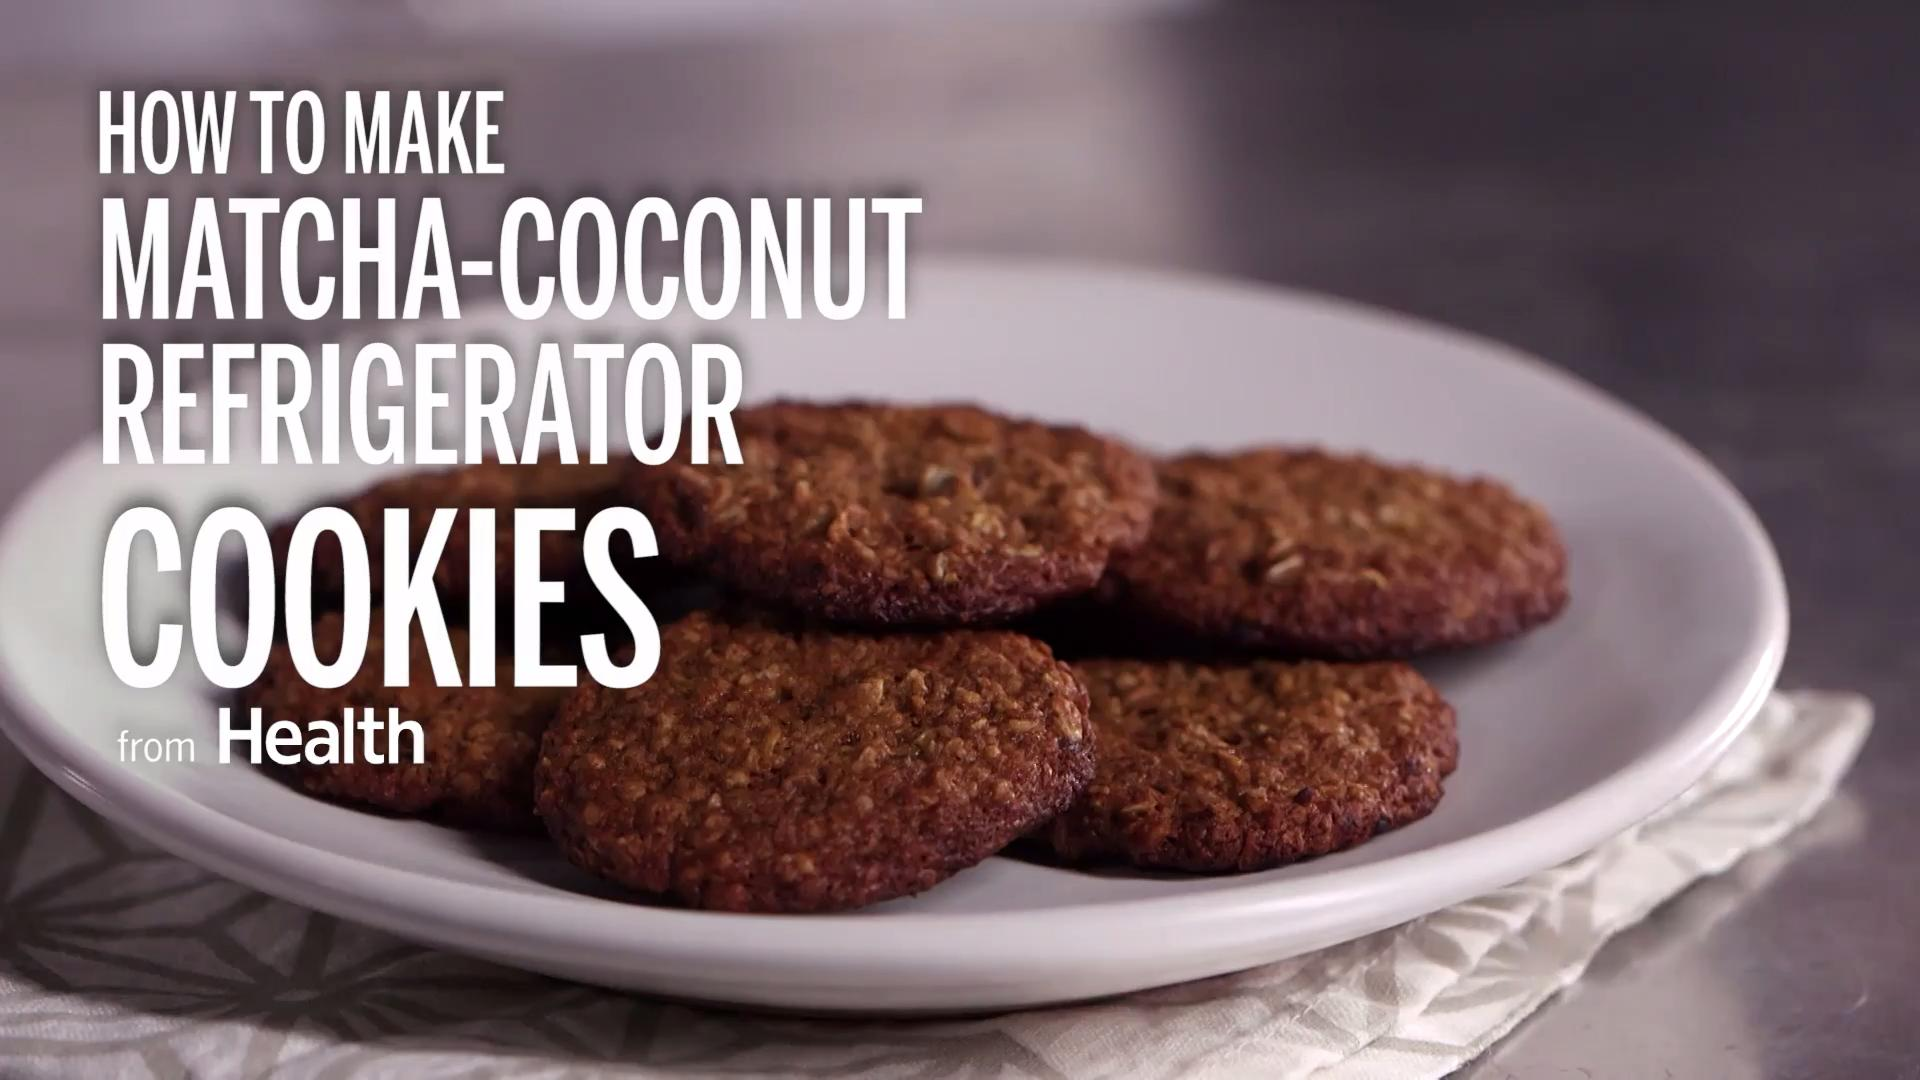 Matcha Coconut Refrigerator Cookies